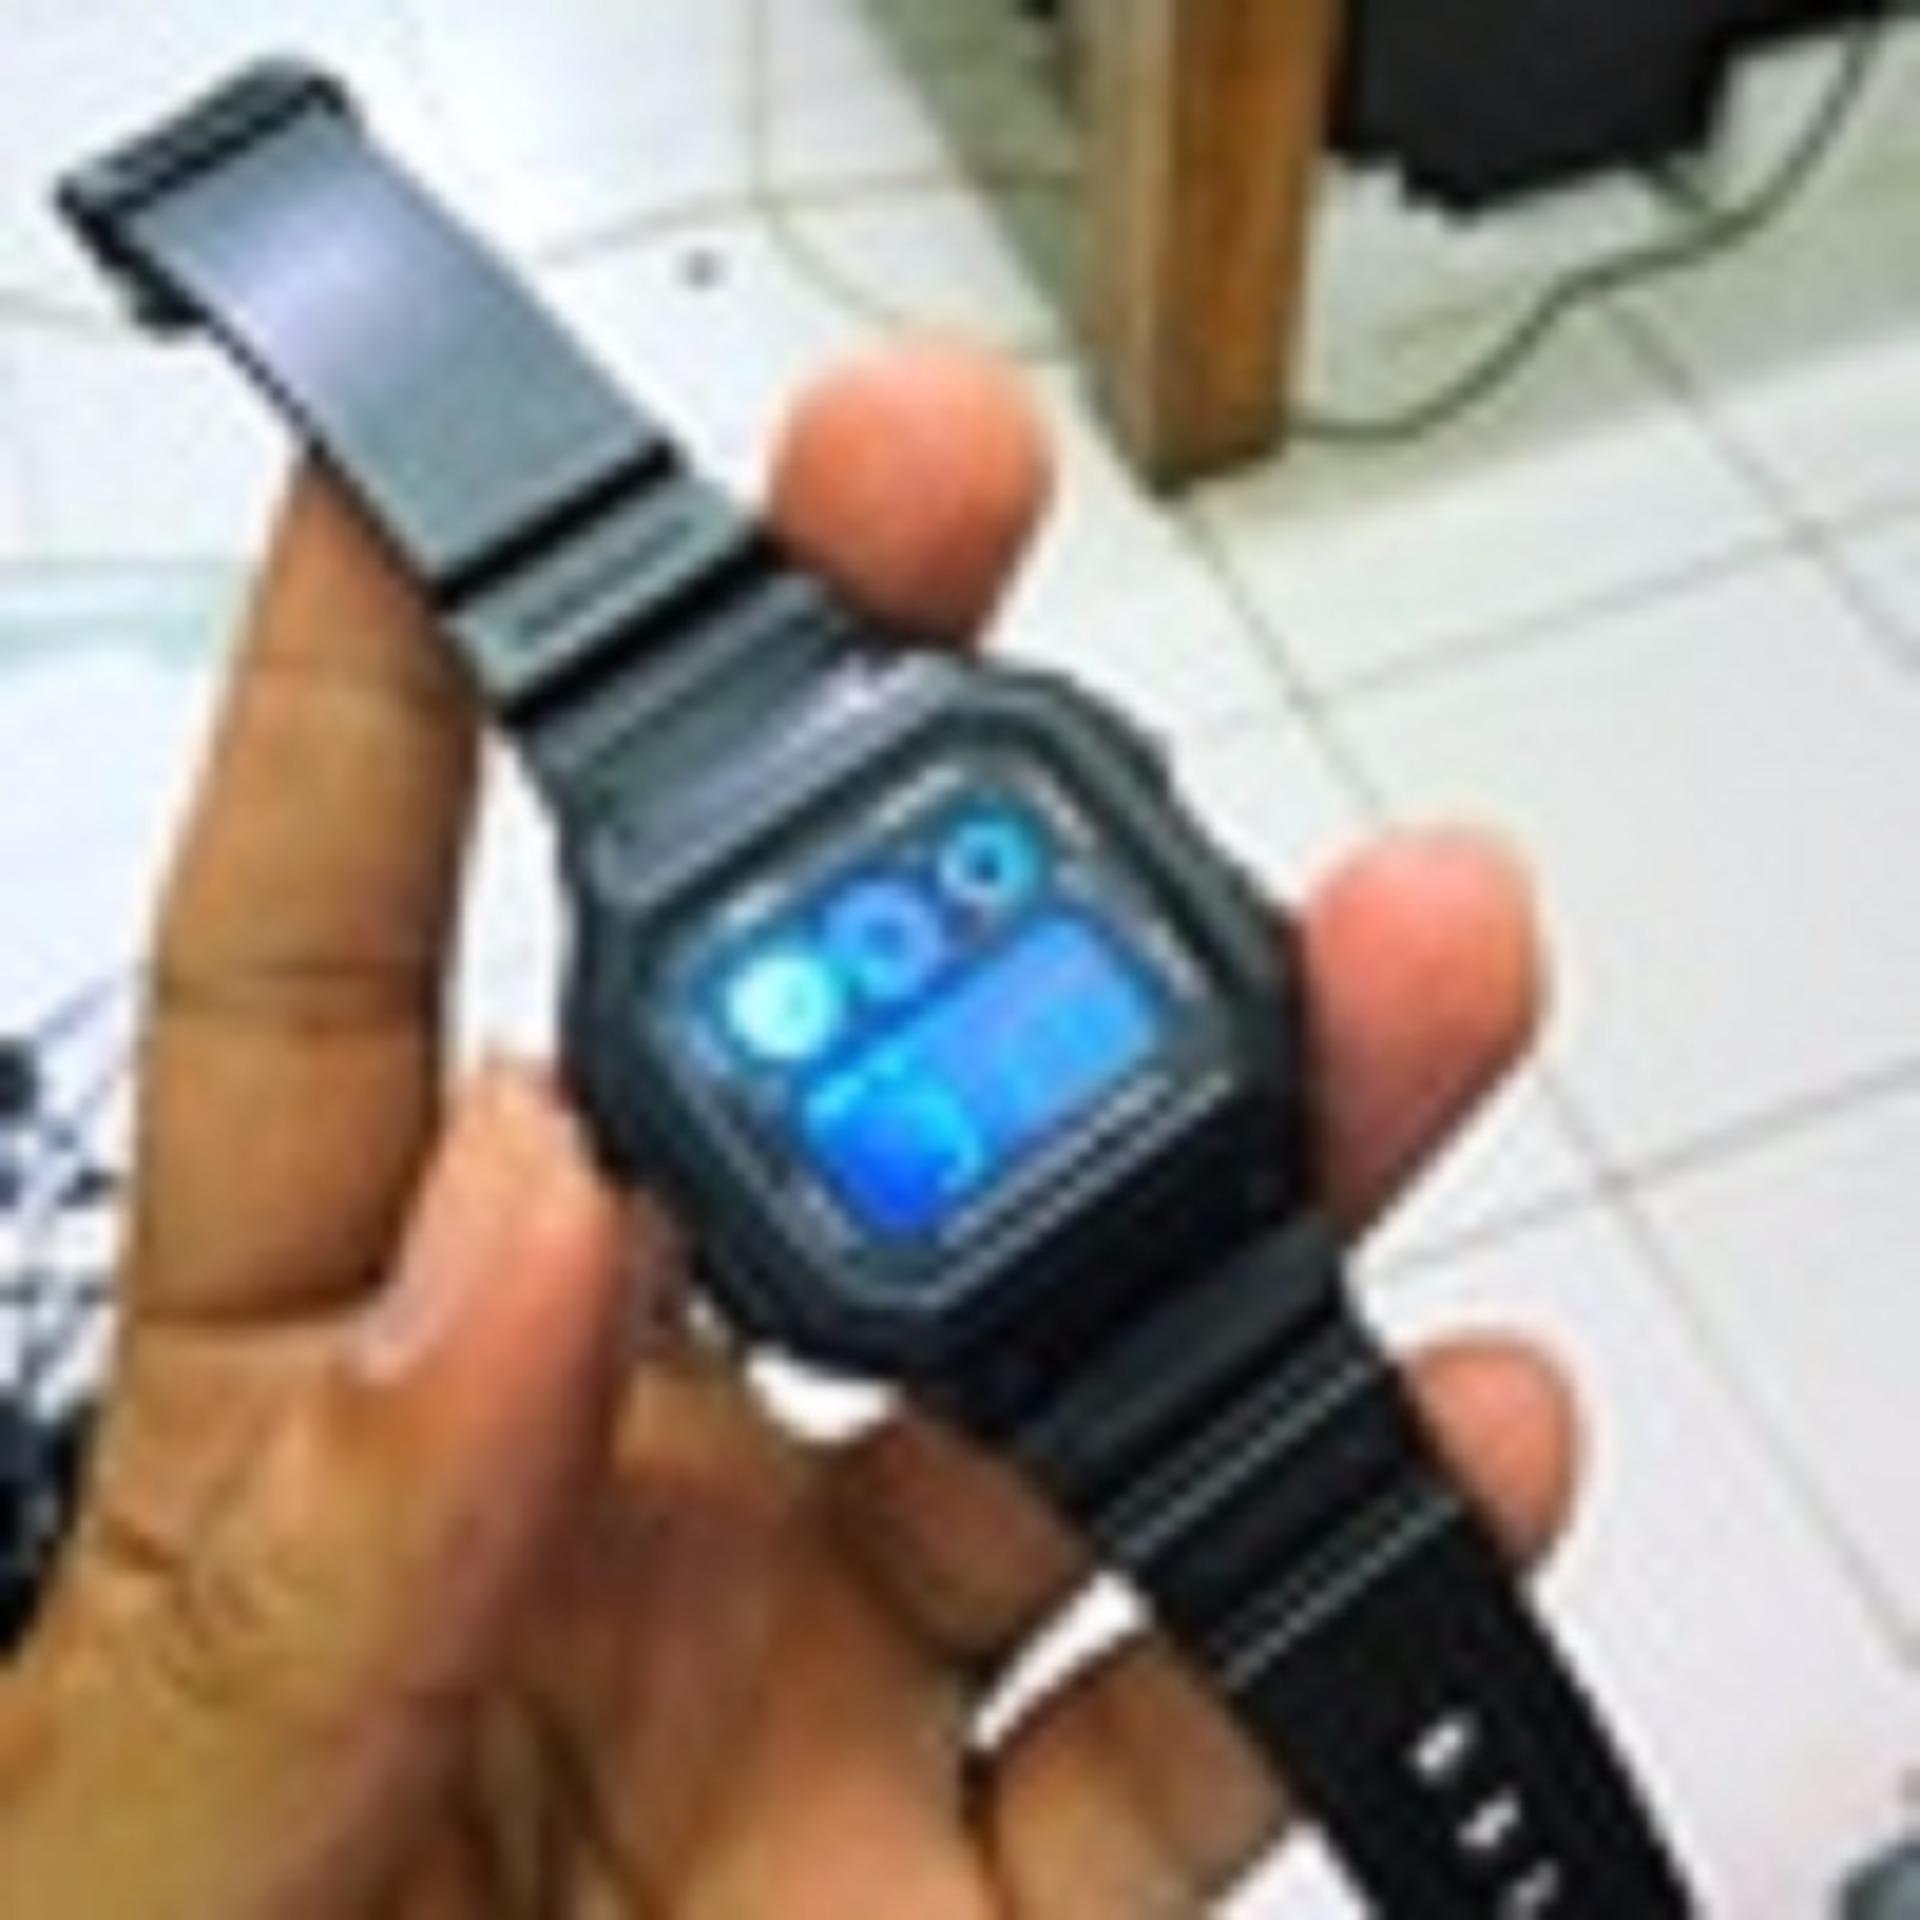 qnq model casio ae1300 qq q&q wateresist tahan air jam tangan unisex mantap!!